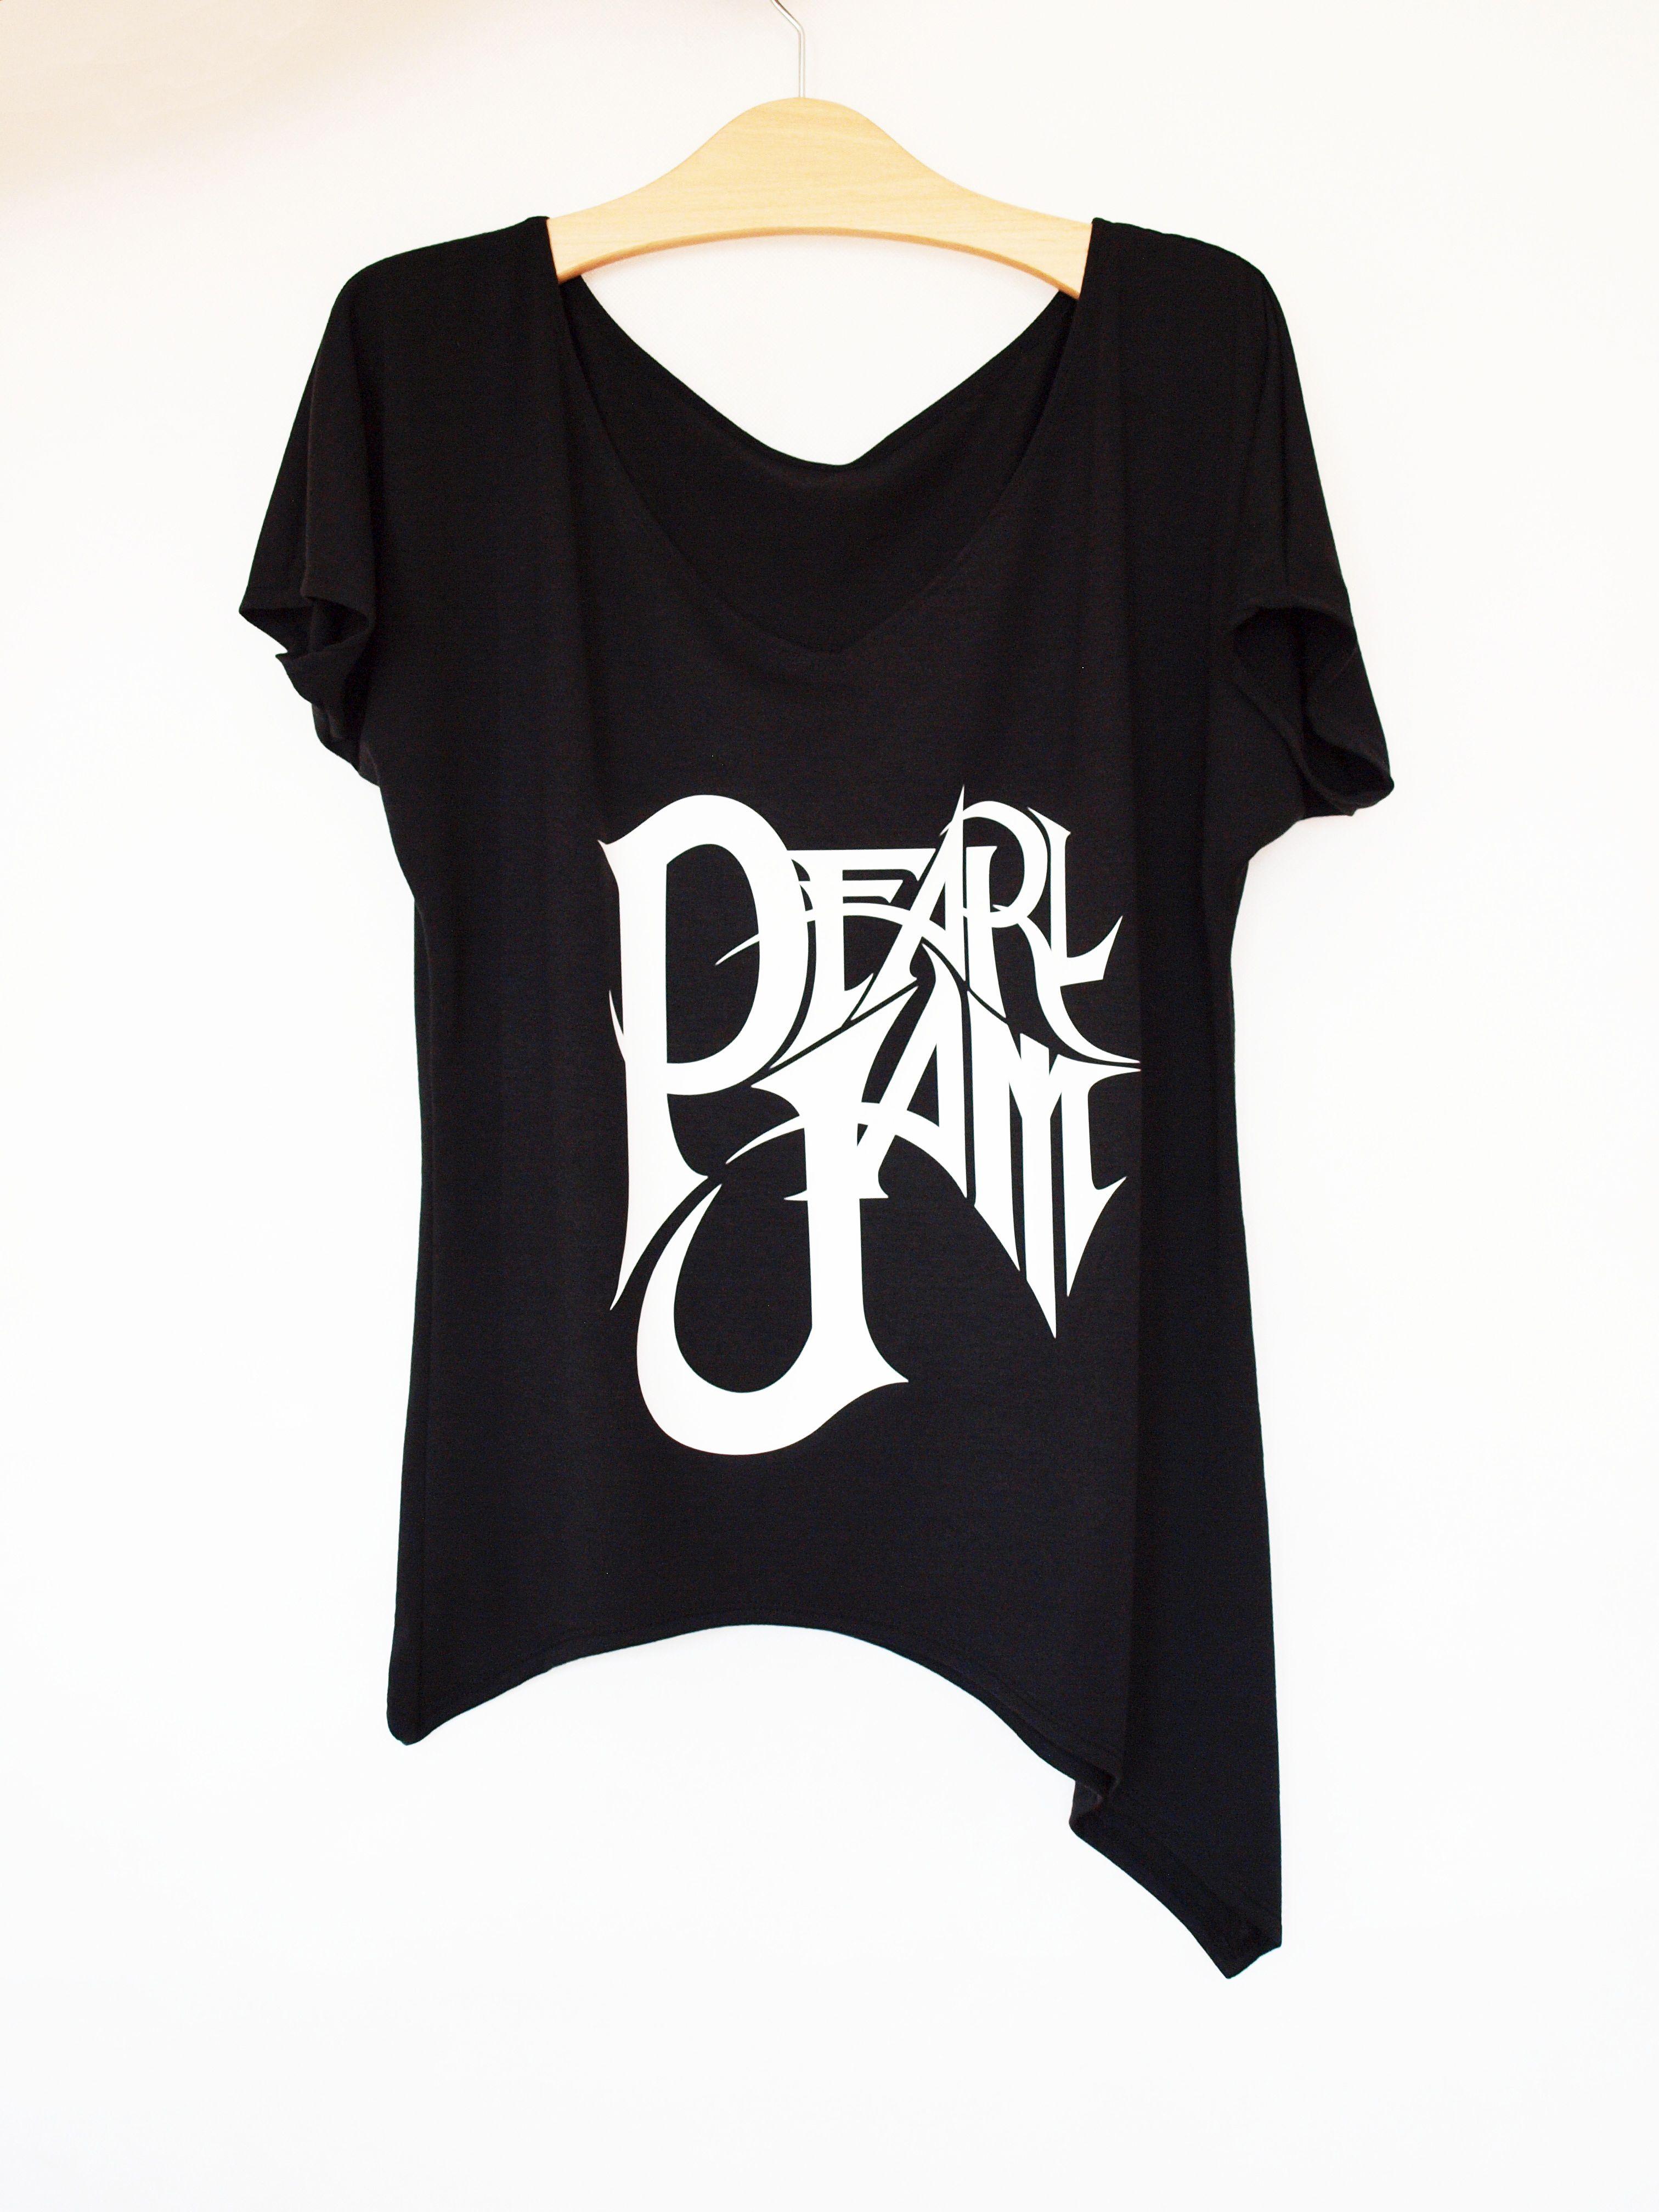 d6fdec645ca Pearl Jam t-shirt in black by rockshirt.etsy.com